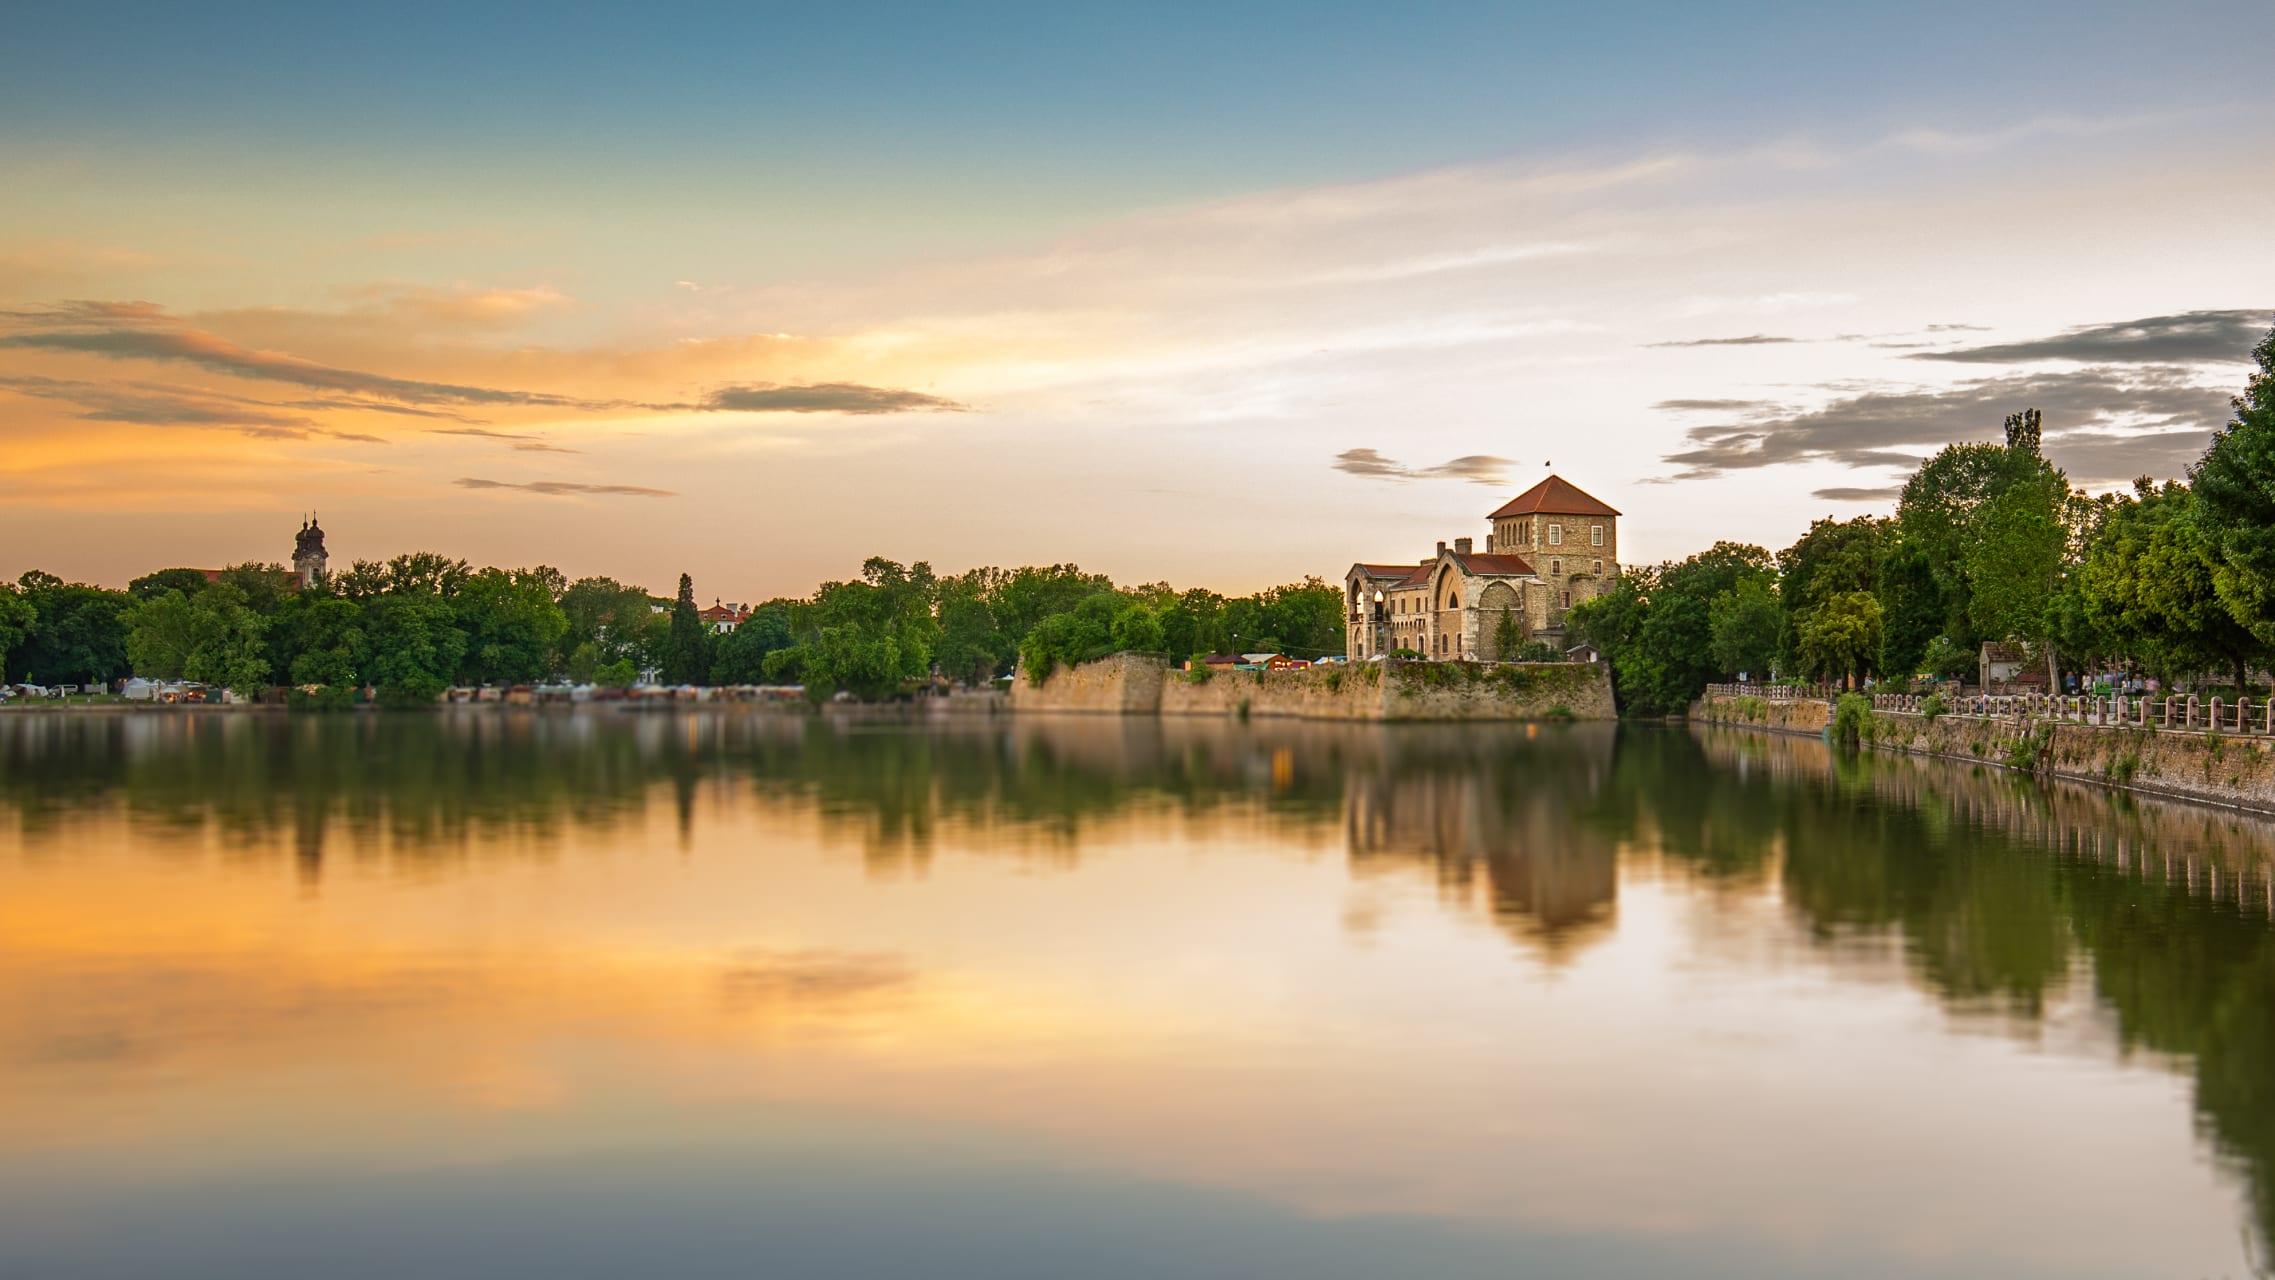 Tata - Hungarian Countryside Tours Series: Tata, the City of Waters